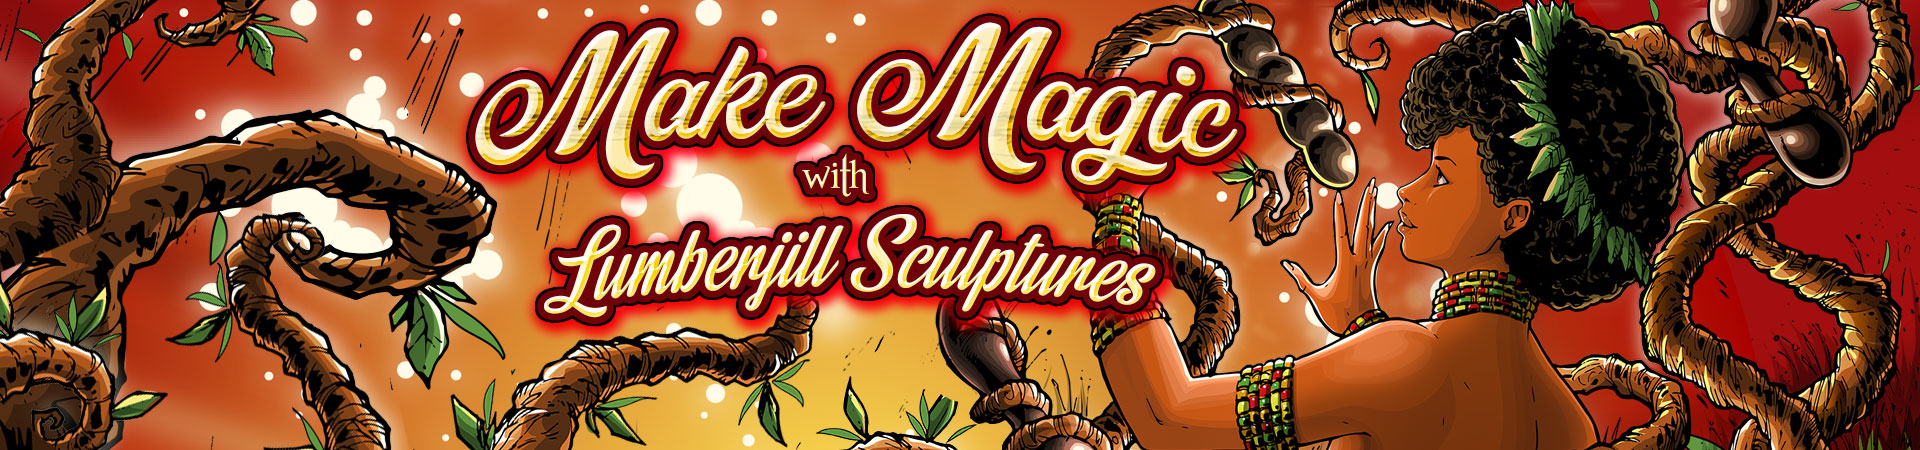 Make Magic With LumberJill Sculptures